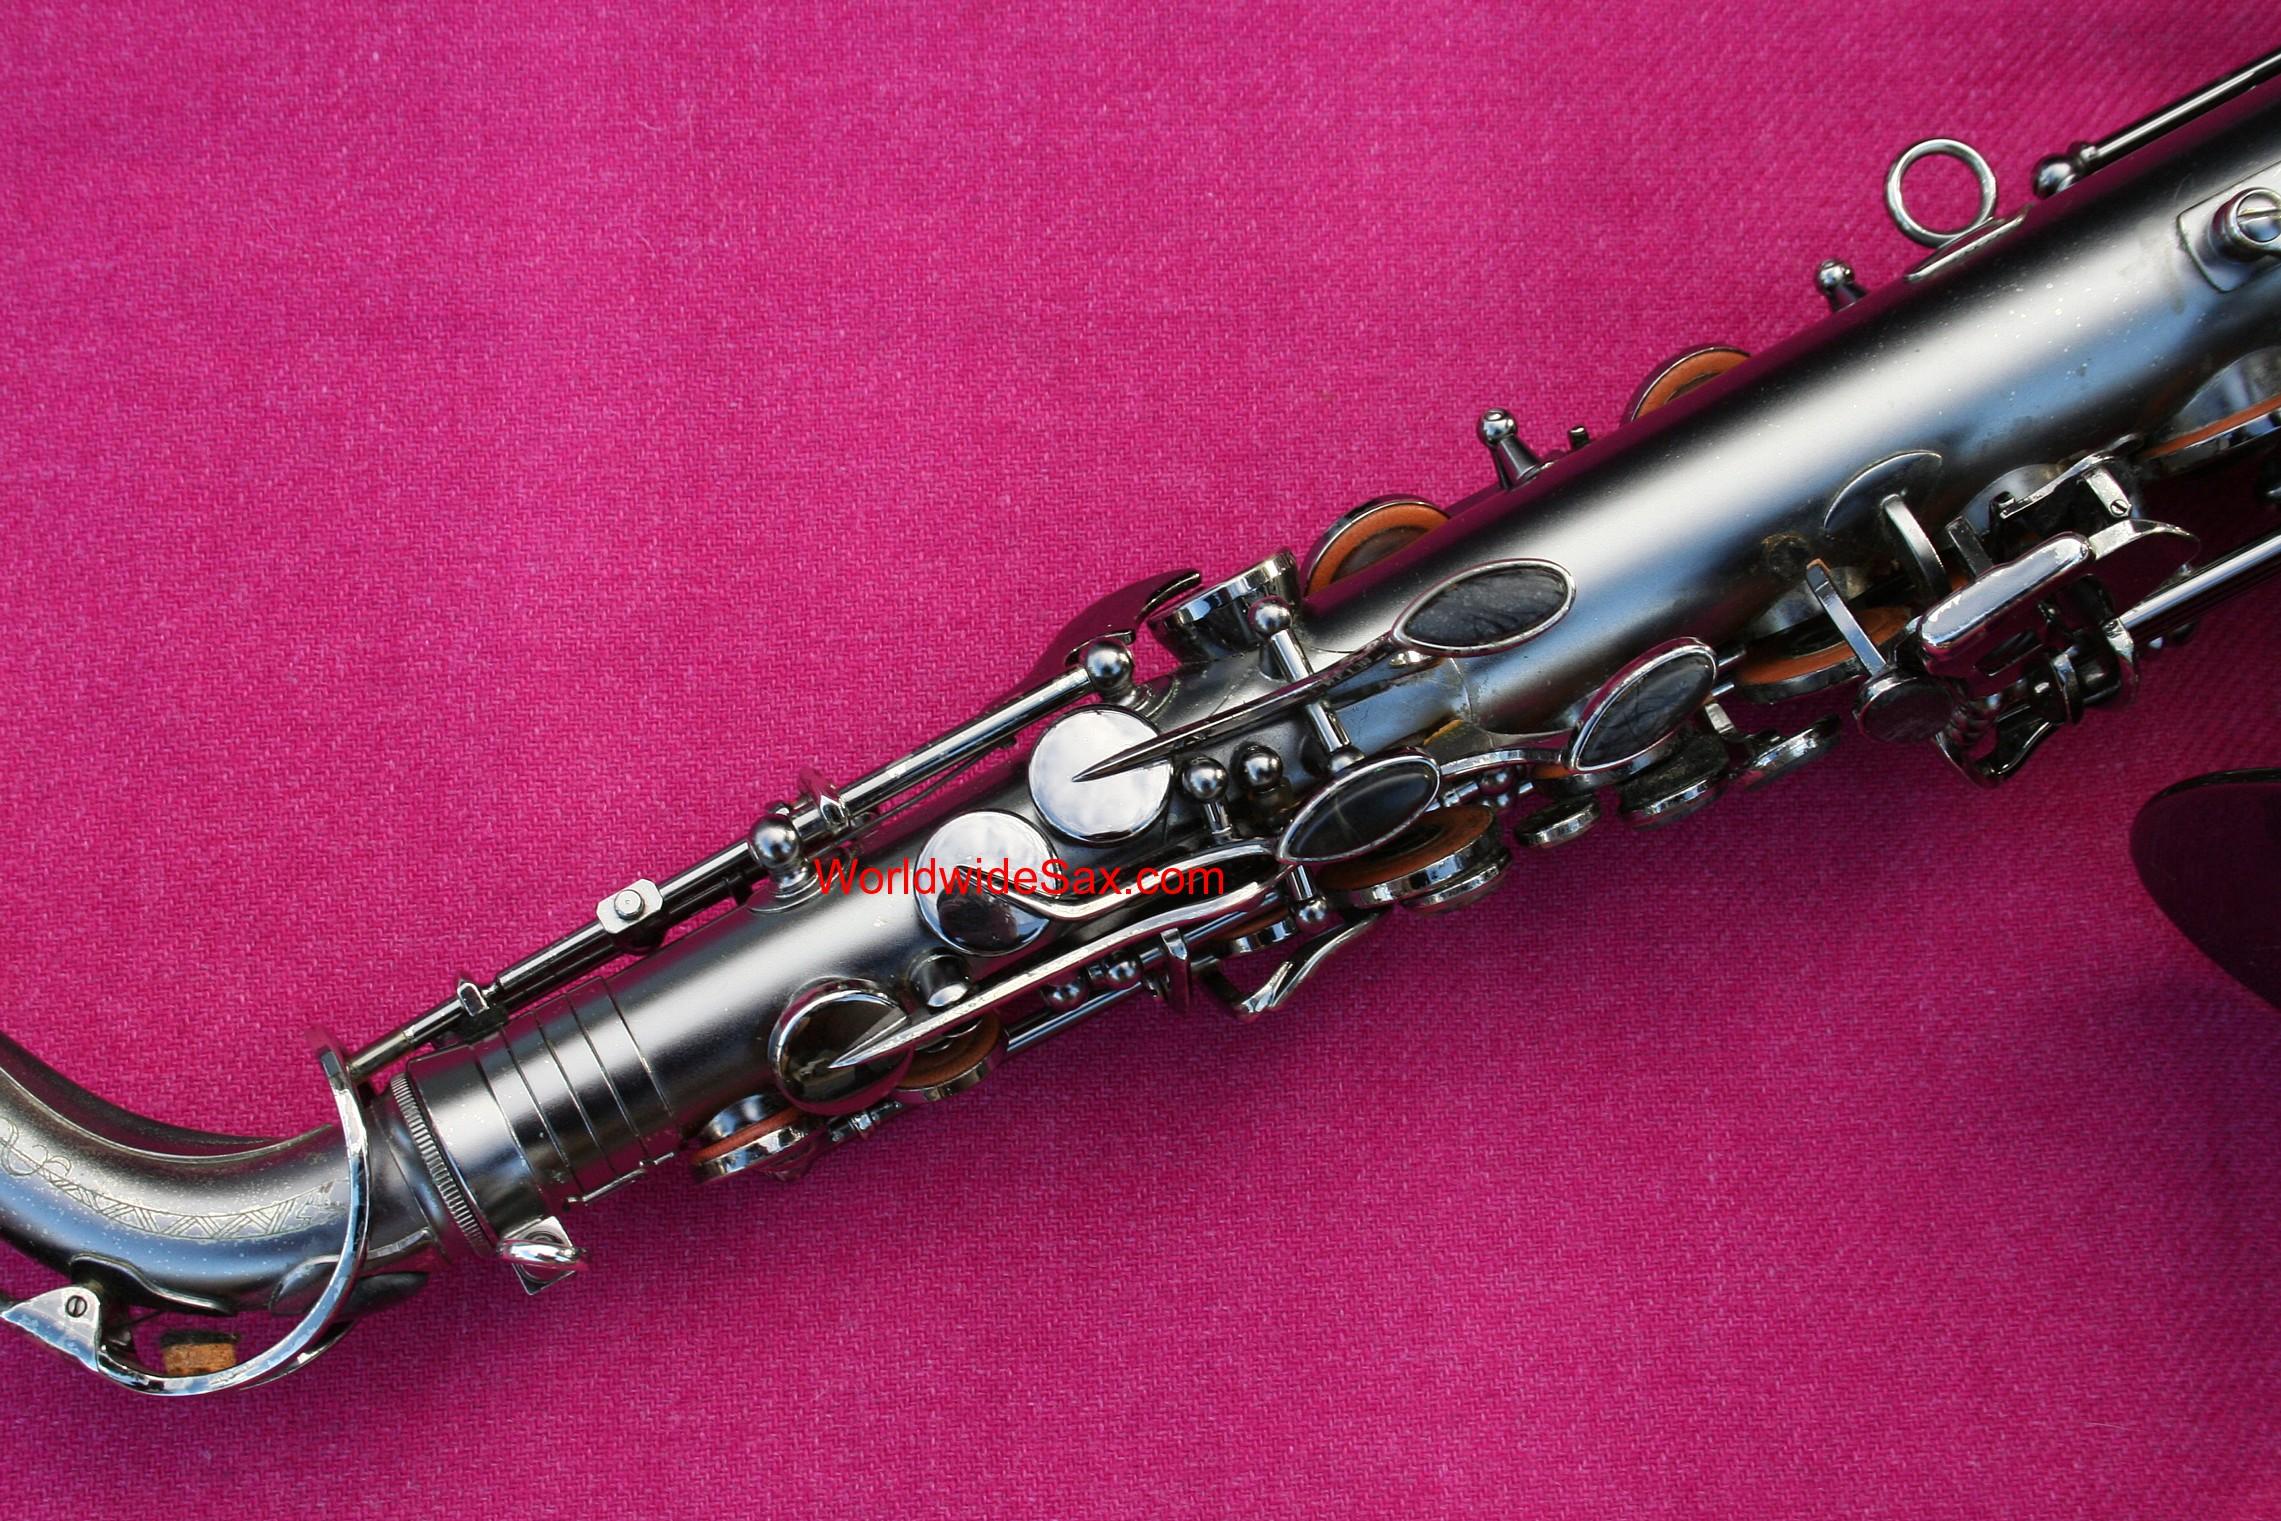 Cannonball Saxophones Price List - #GolfClub